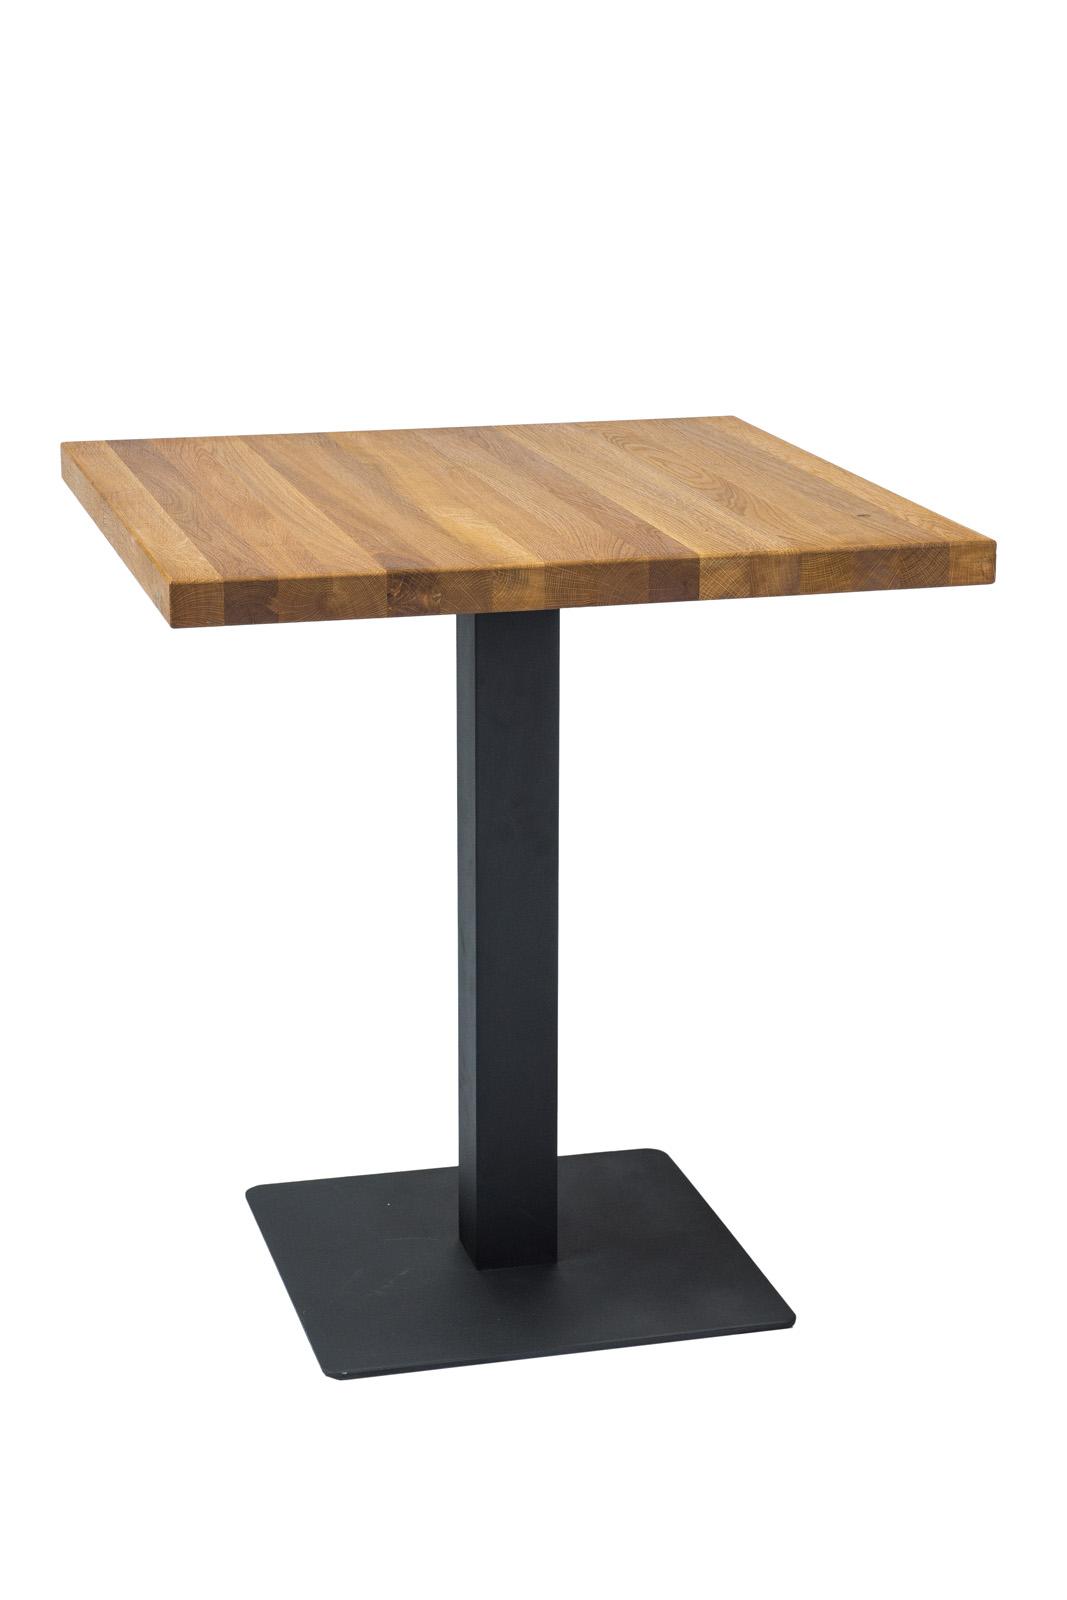 Masa din metal si lemn de furnir Puro, L80xl80xh76 cm imagine